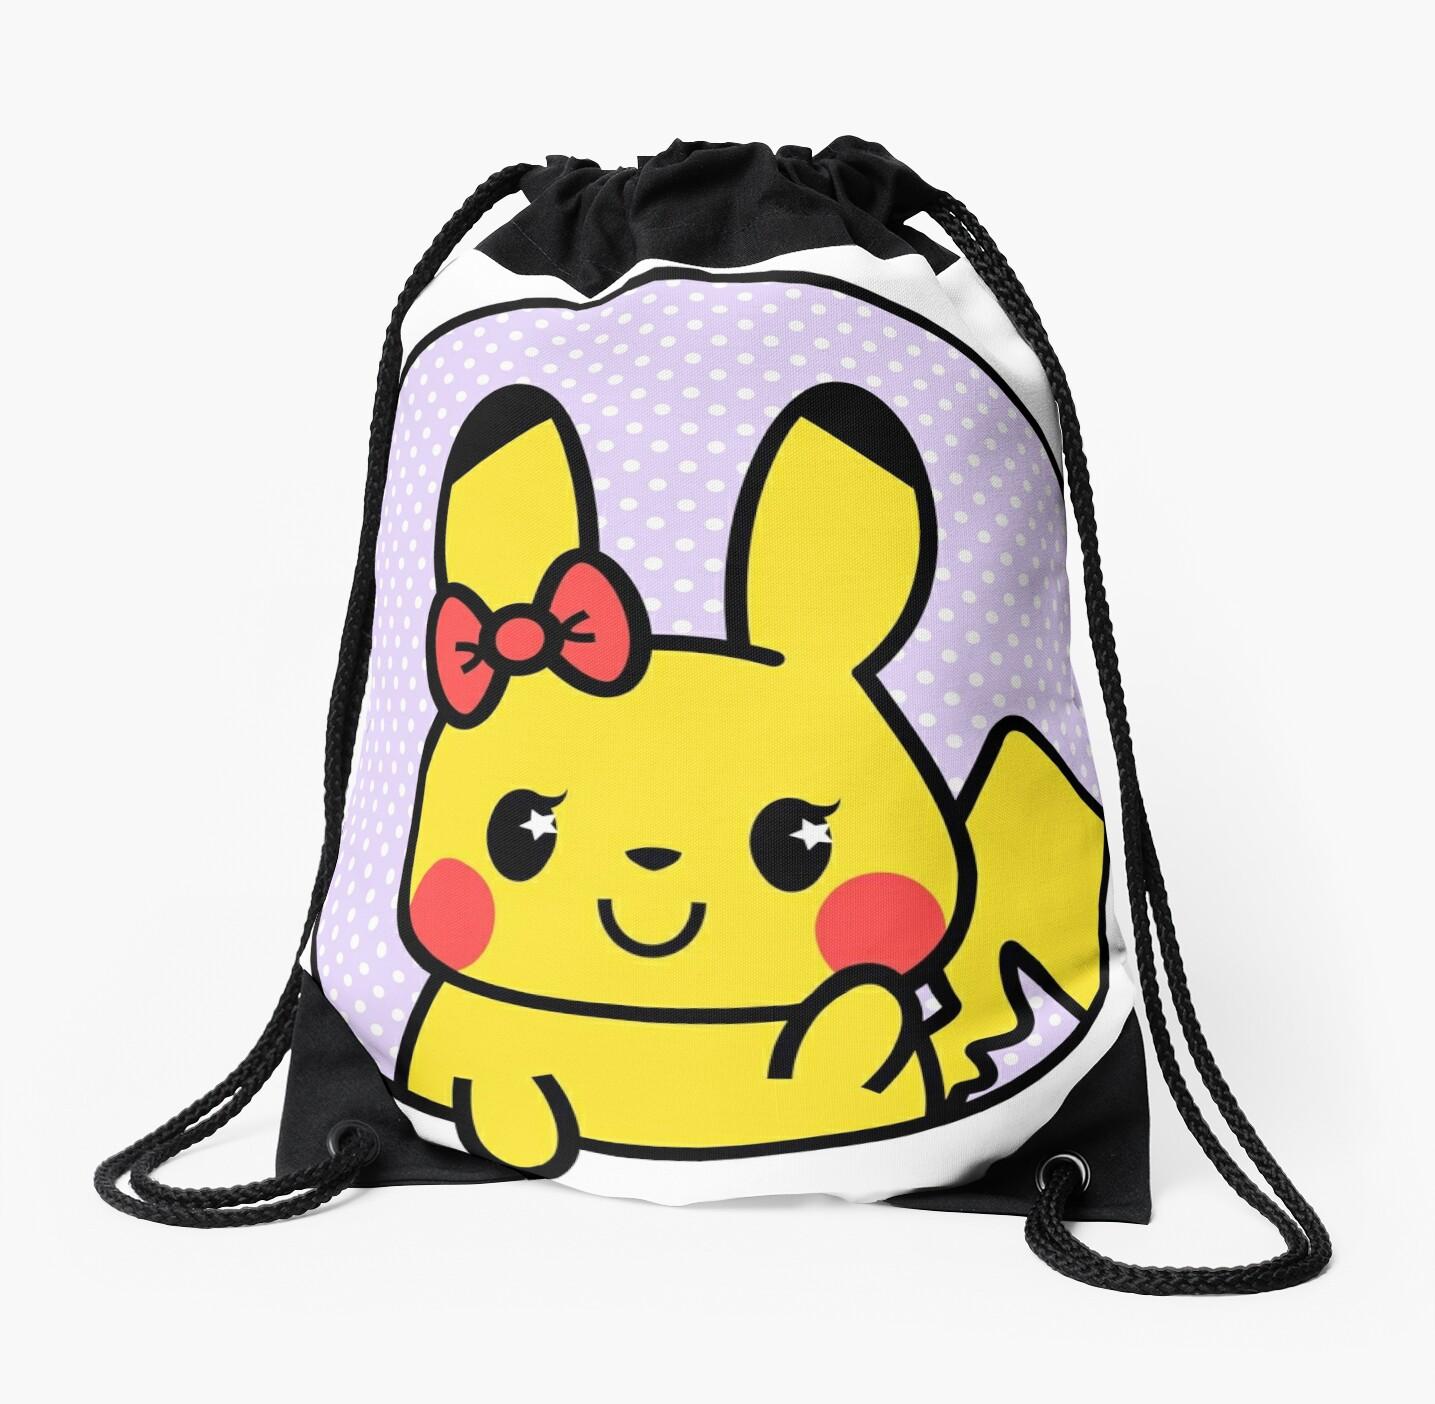 Kawaii Bow Bag Drawstring Bag X Bg Fff